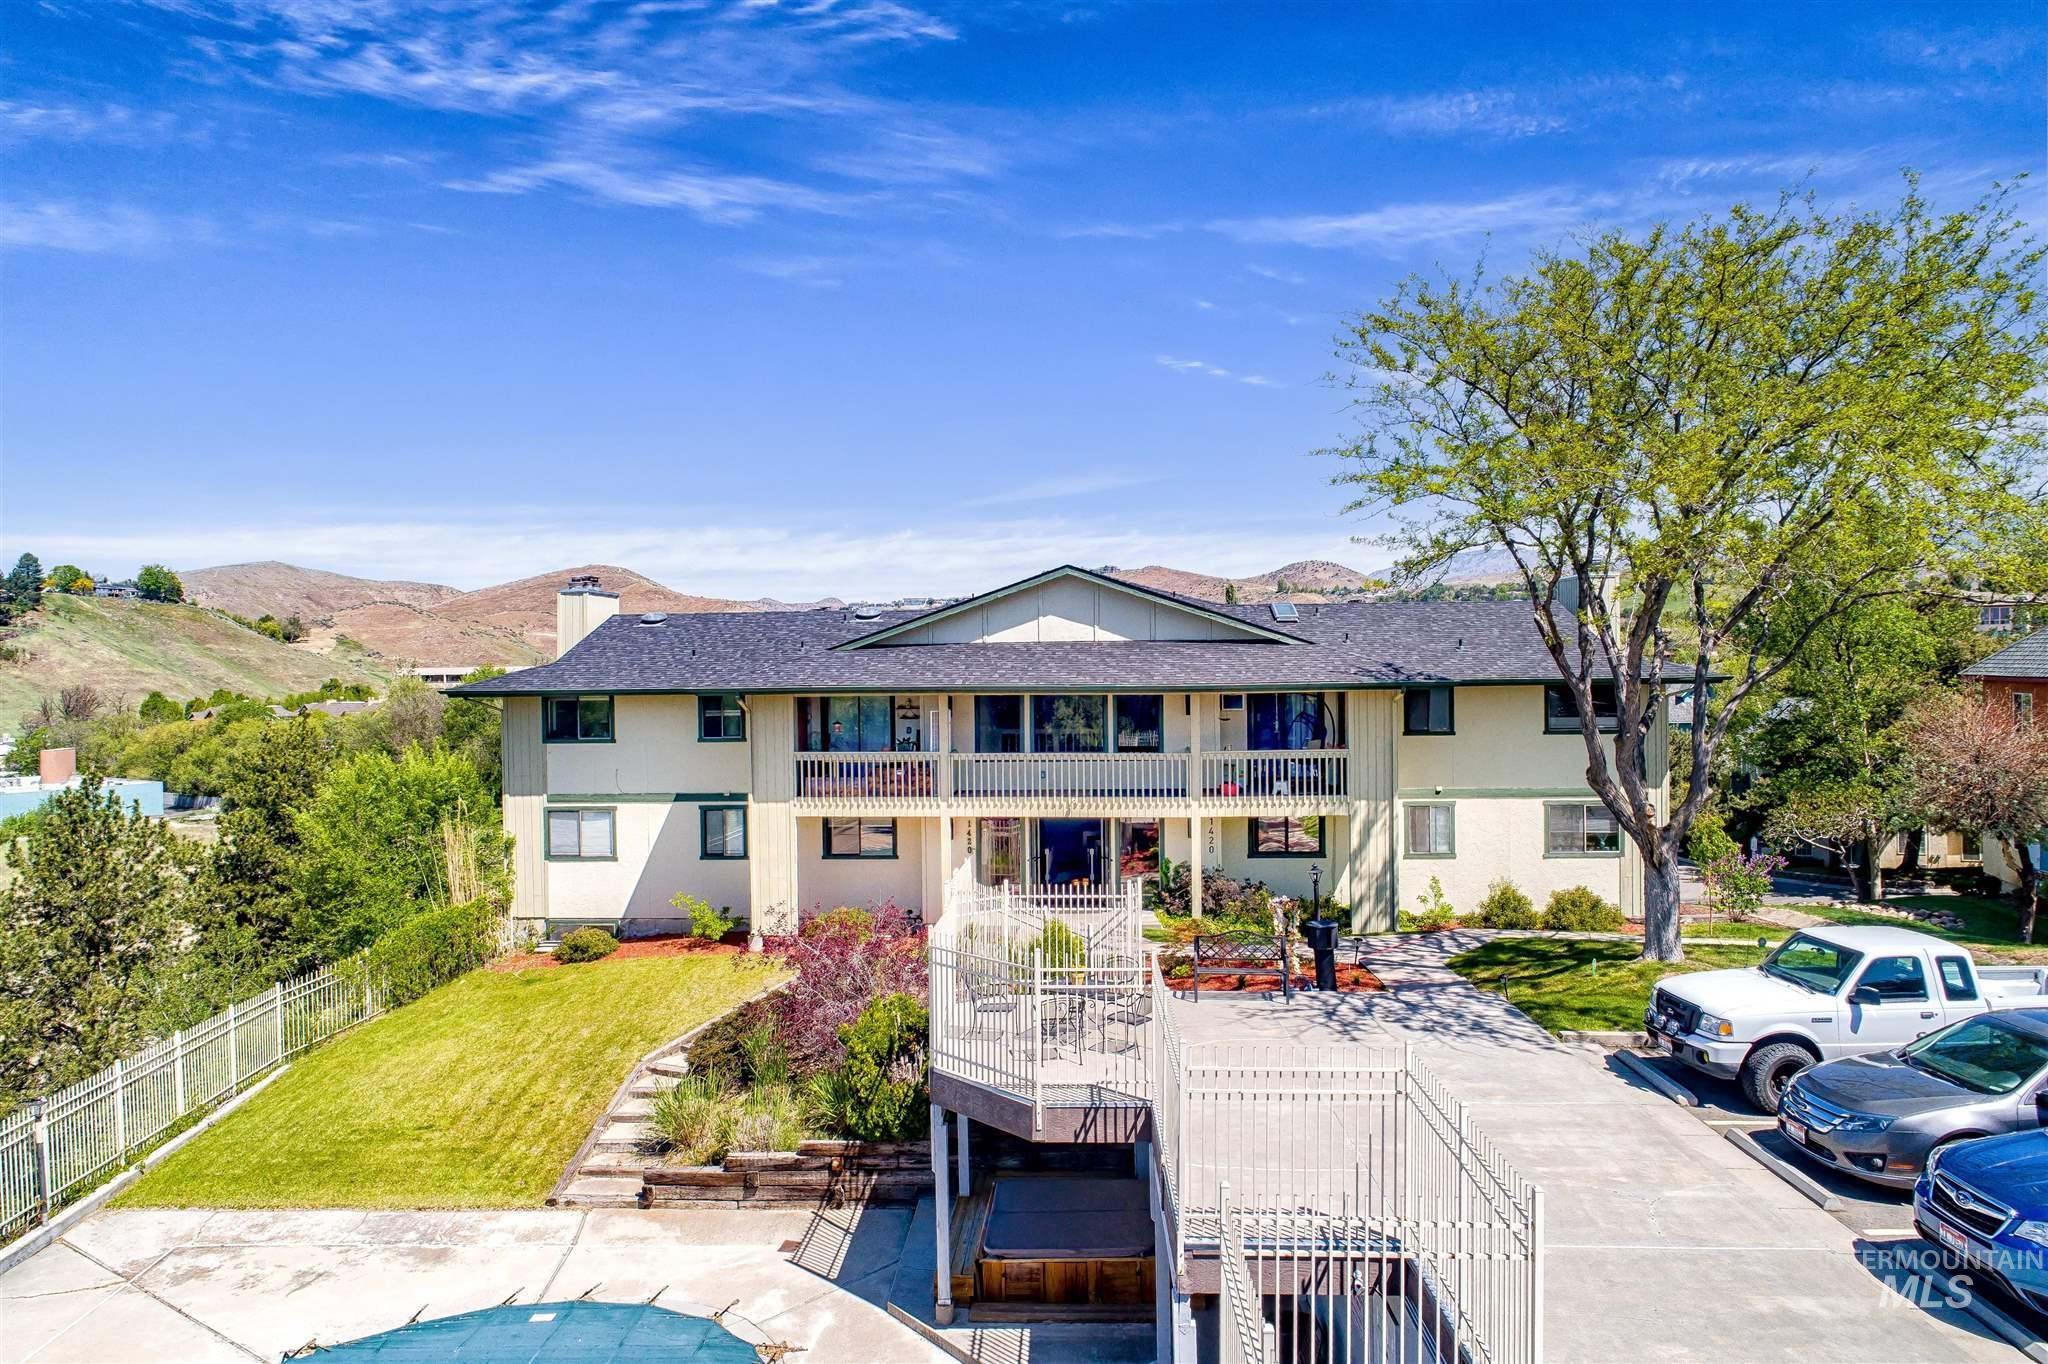 1420 W Camel Back Lane # 204 Property Photo - Boise, ID real estate listing